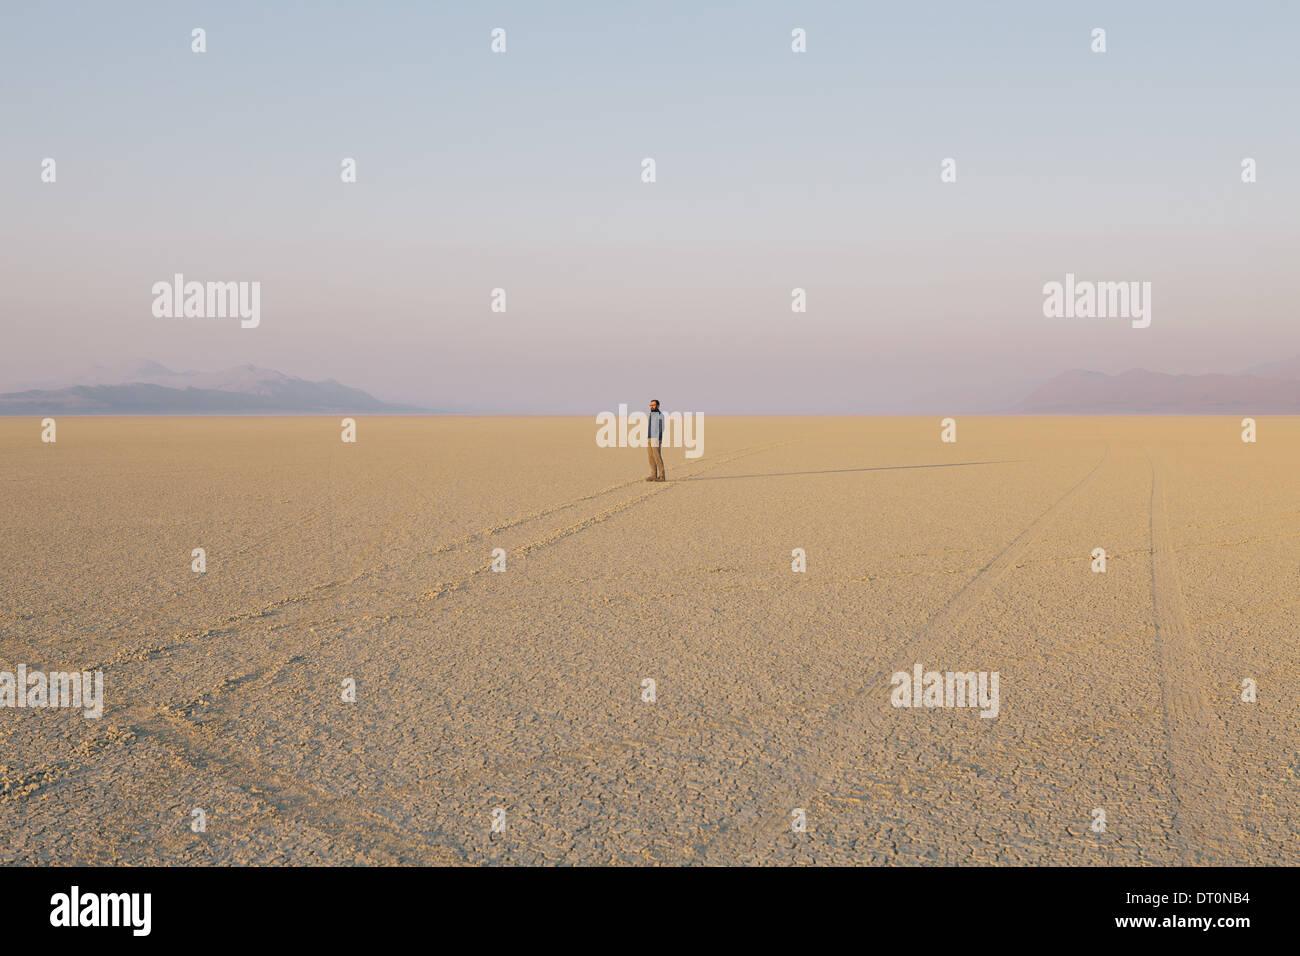 Black Rock Desert Nevada USA The figure of man in the empty desert landscape Stock Photo